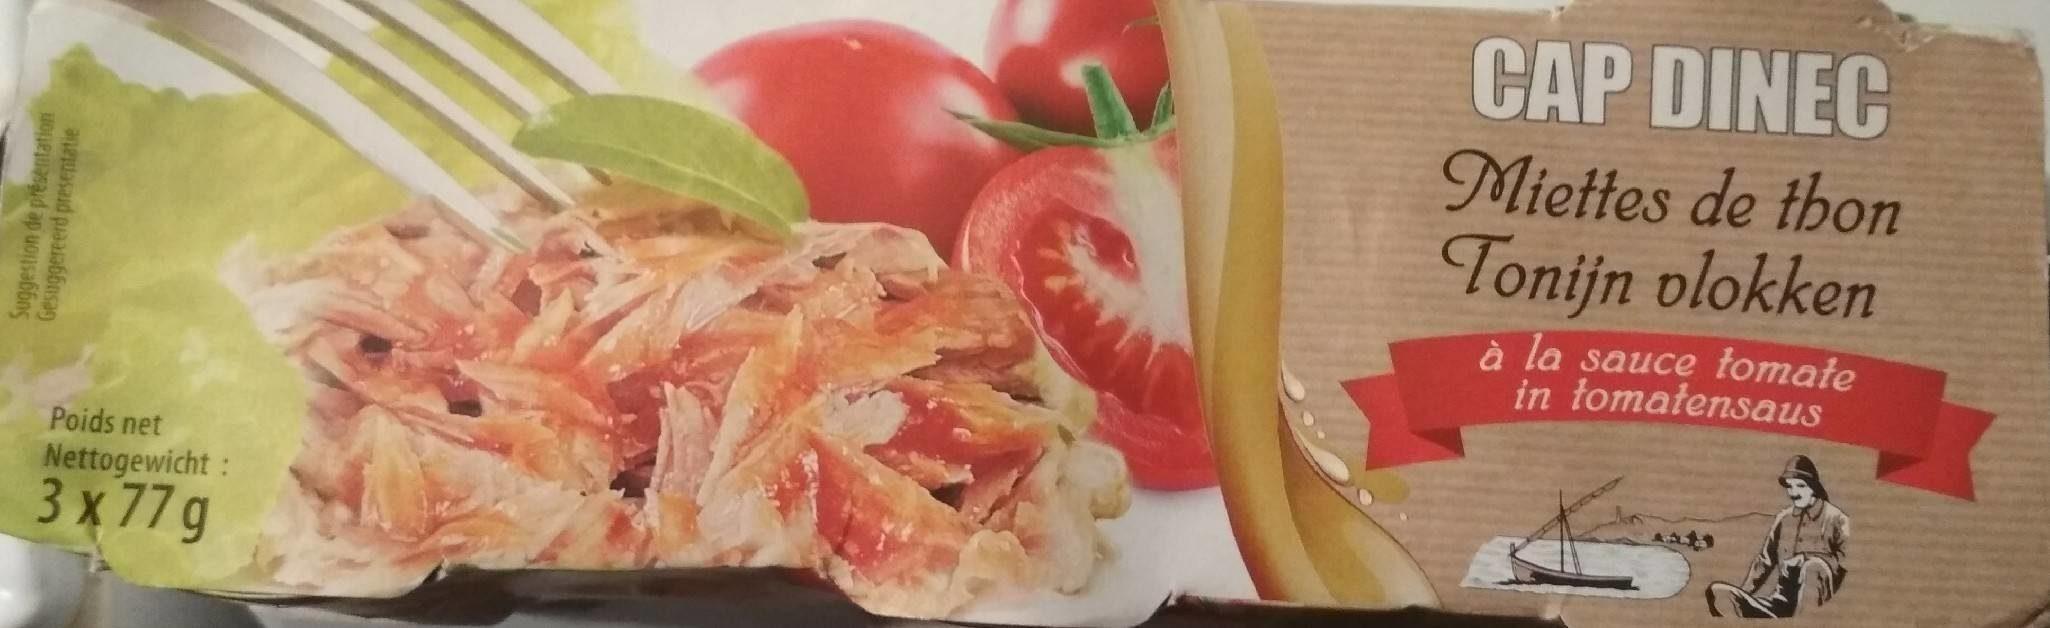 Miettes de Thon à la Sauce Tomate - Prodotto - fr